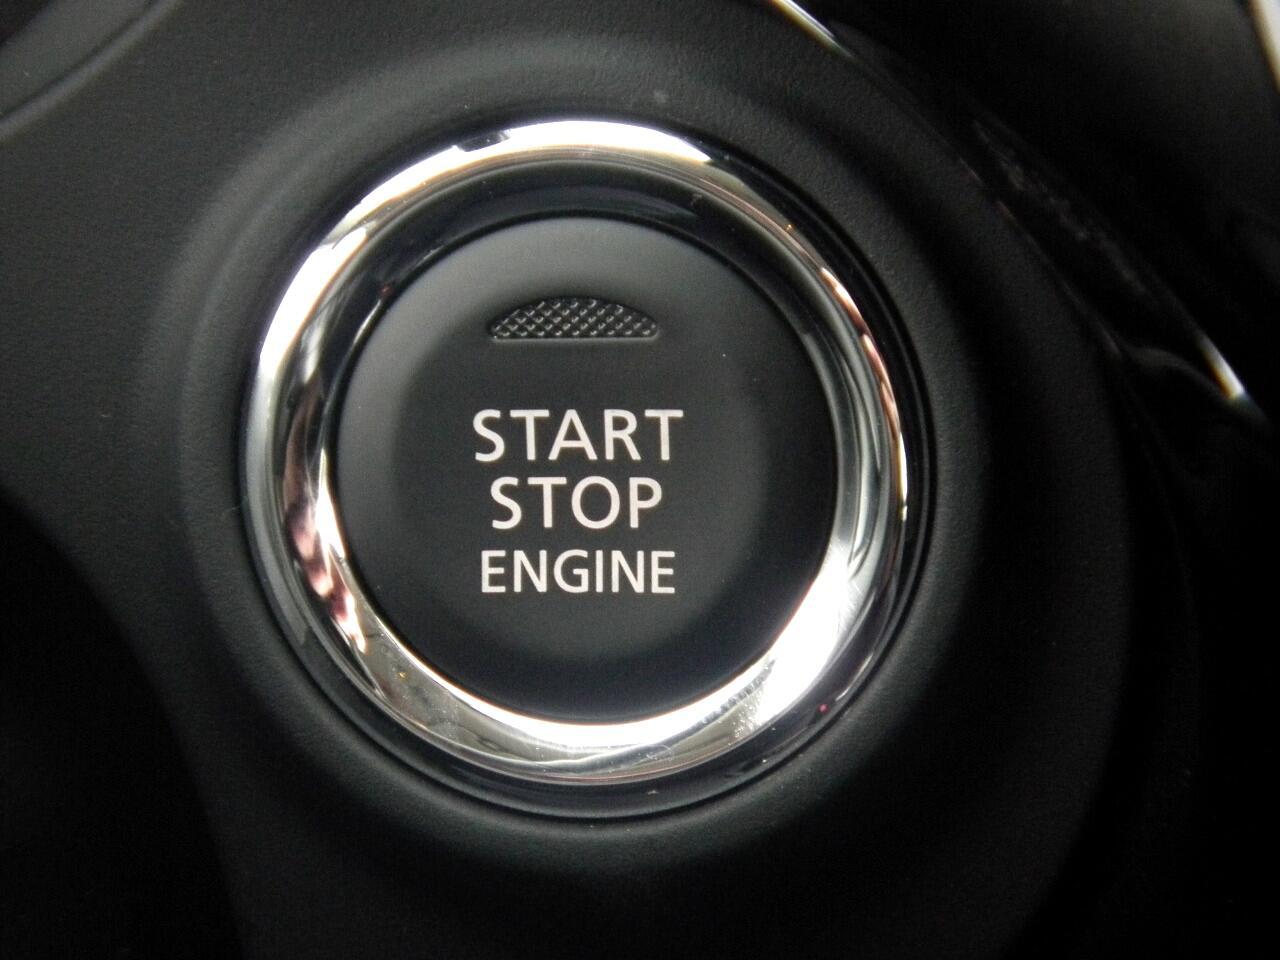 2019 Mitsubishi Outlander SEL S-AWC